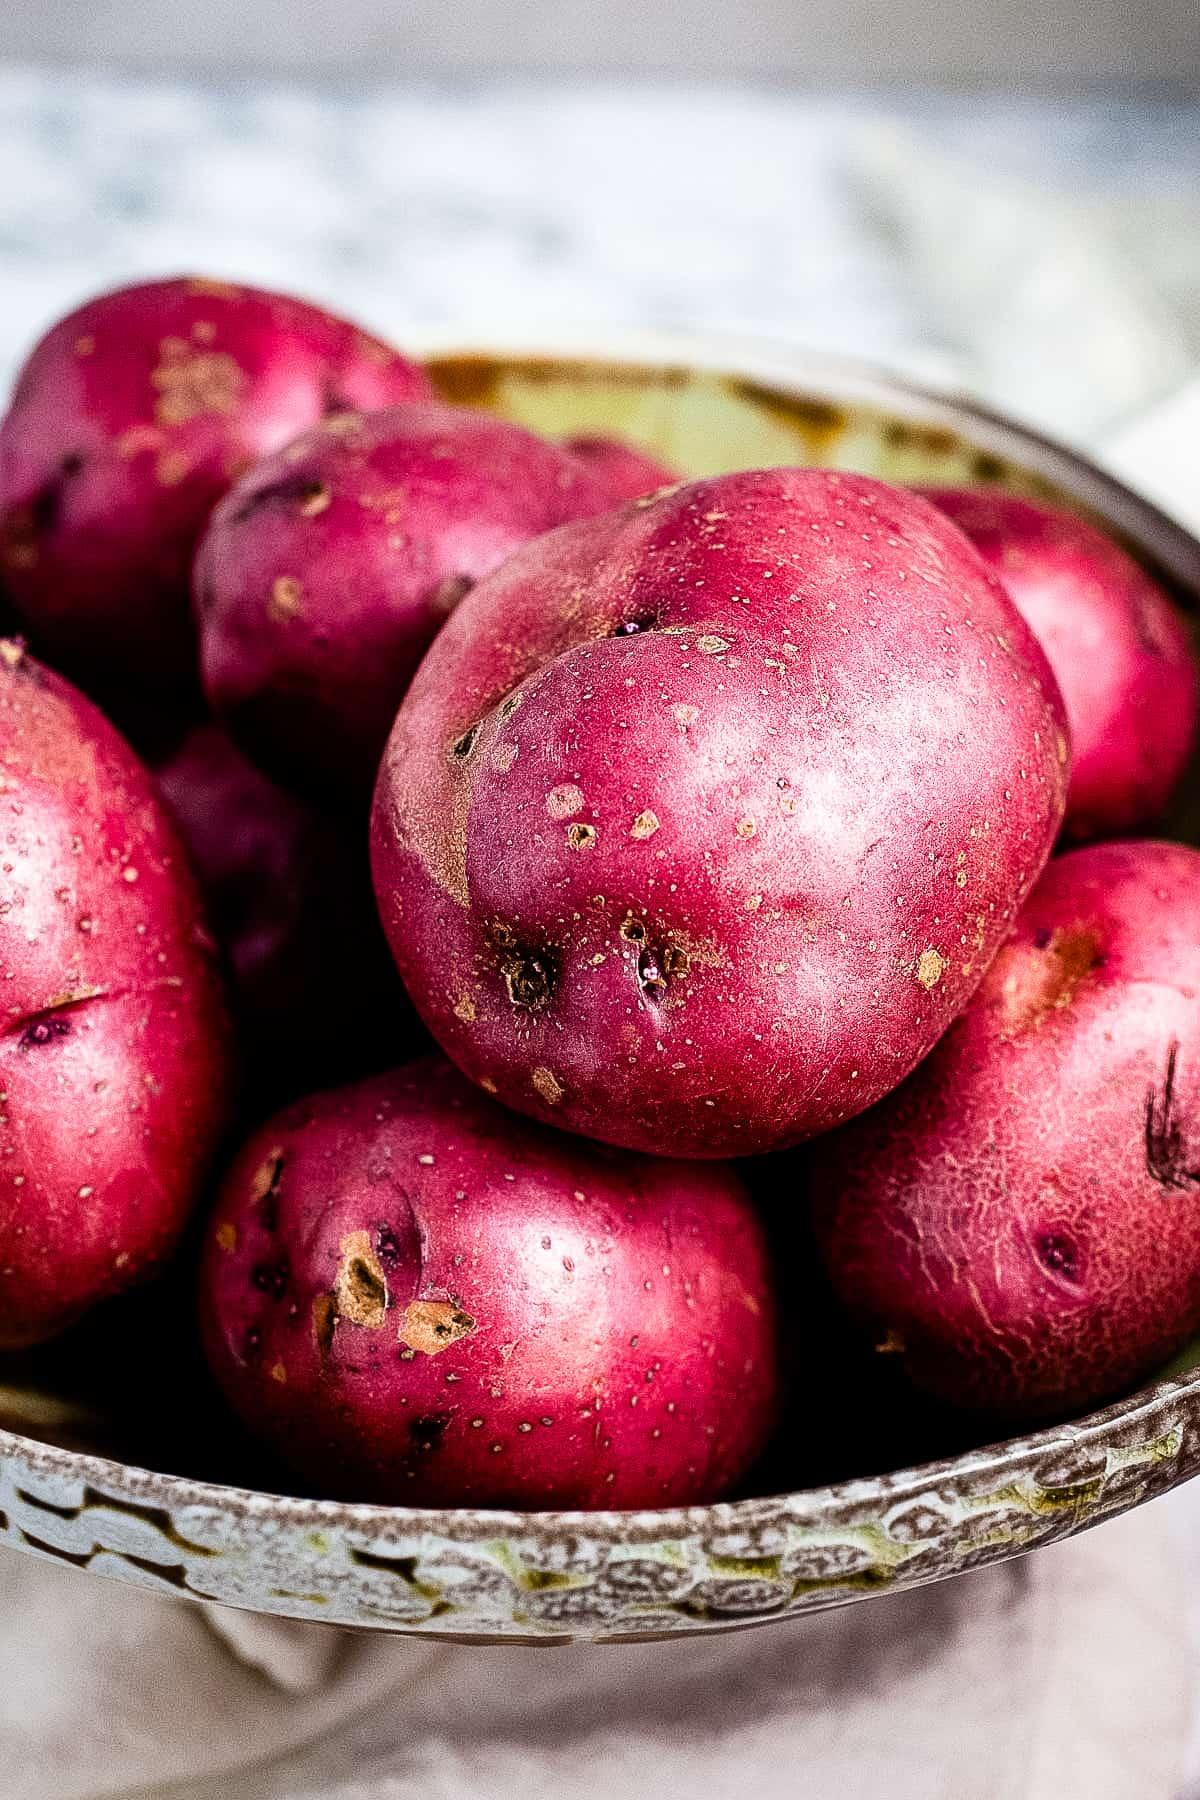 Red potatoes in big bowl